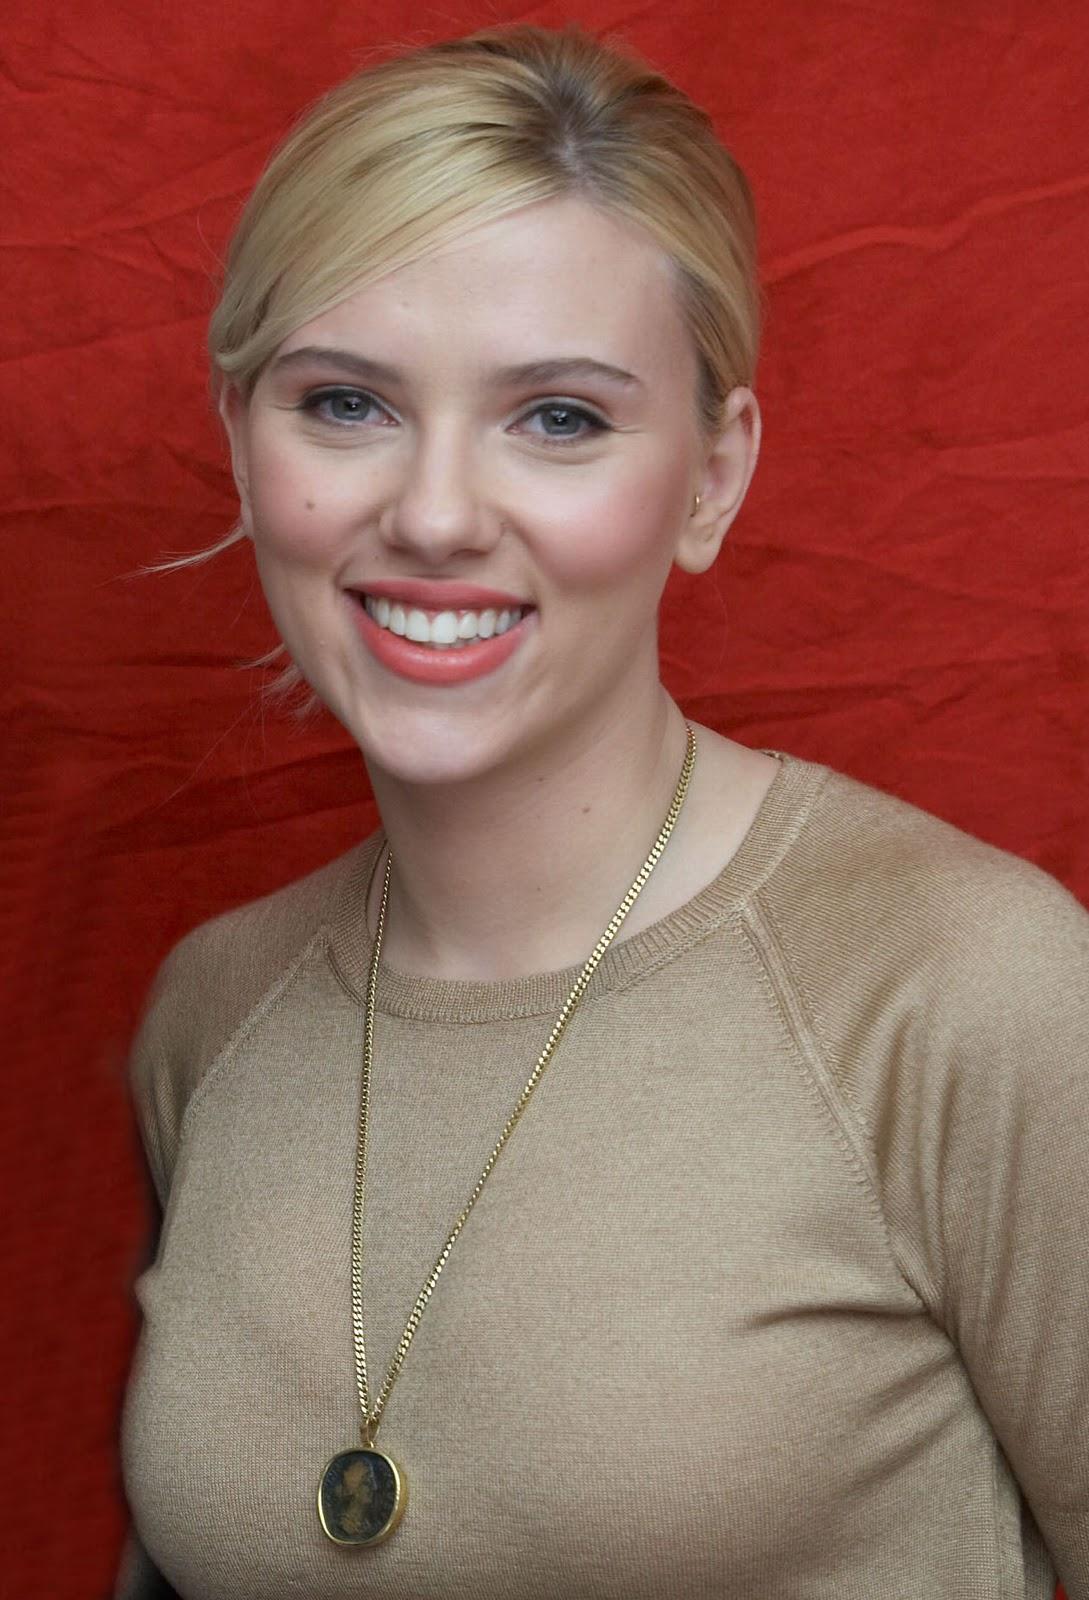 http://2.bp.blogspot.com/-iJ4QR_cd24g/ToTmN1ATBwI/AAAAAAAAALQ/WkanNaBUFJY/s1600/Scarlett+Johansson+12.jpg